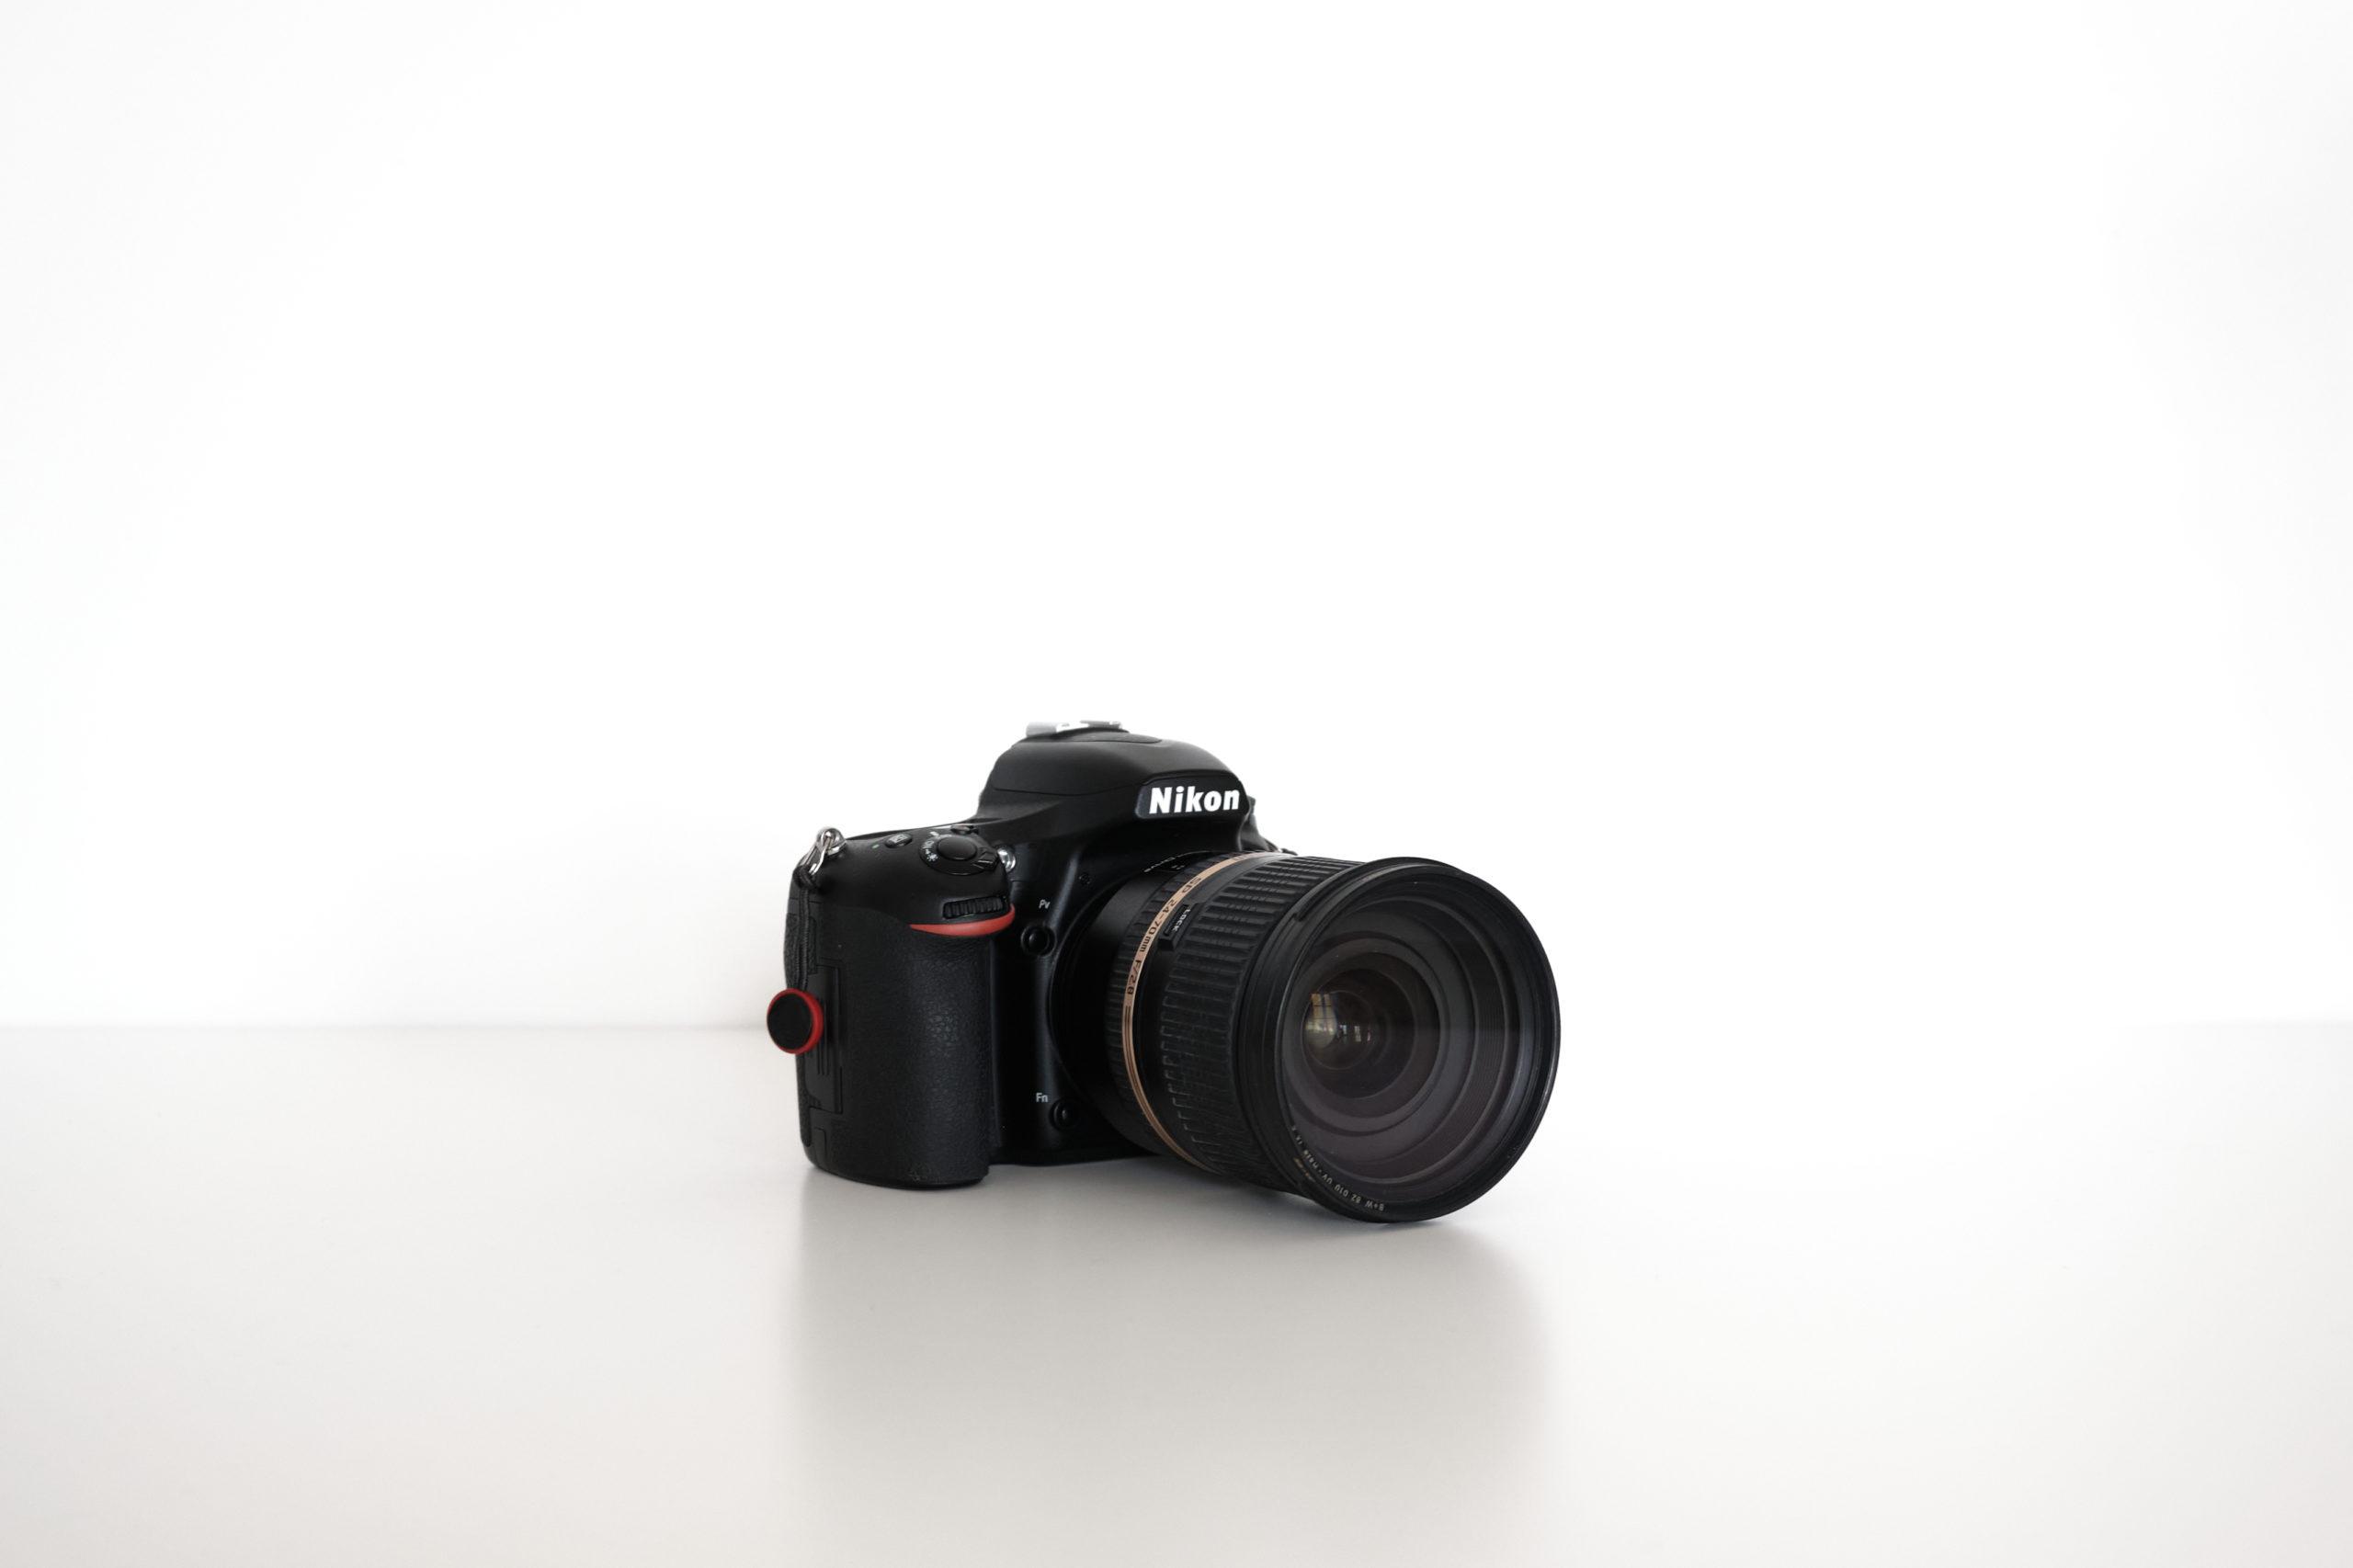 Boitier plein format Nikon D750